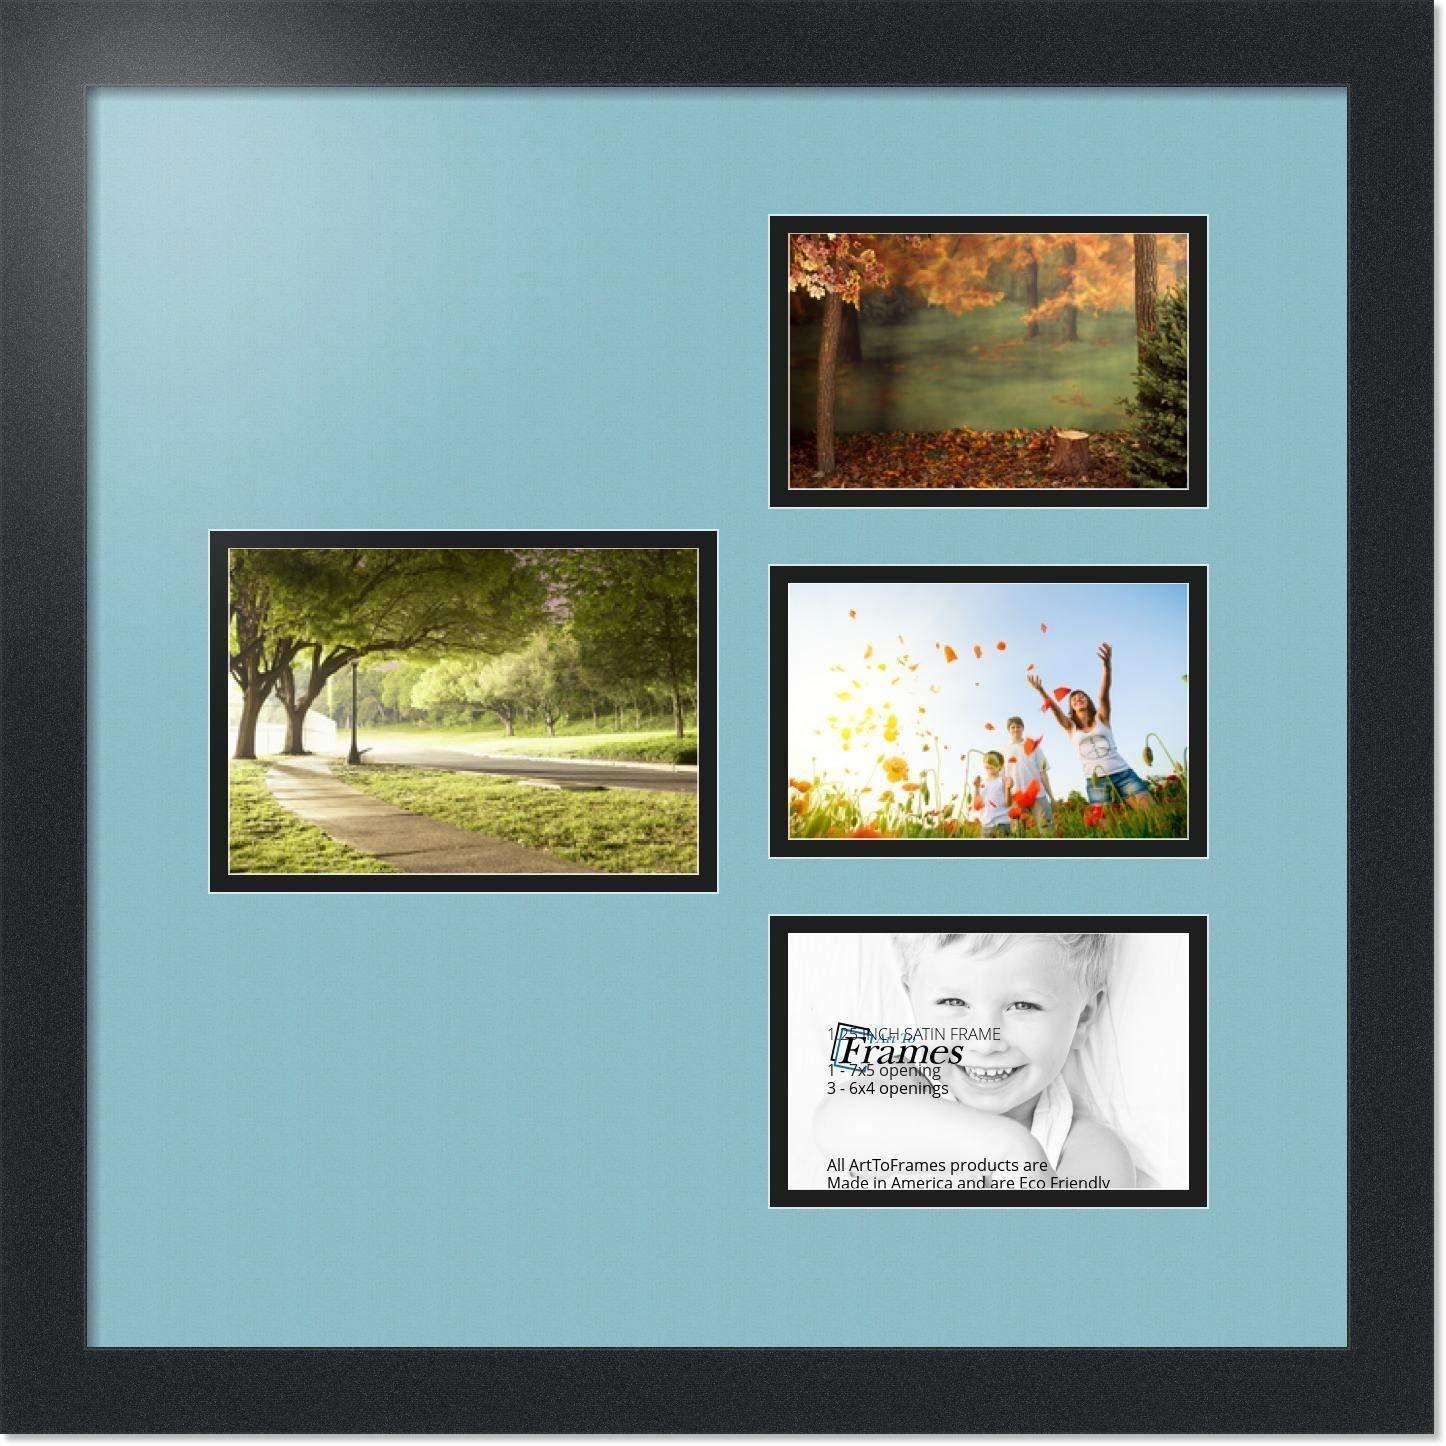 arttoframes alphabet写真画像フレームwith 1 4 x 6と3 3 x 5